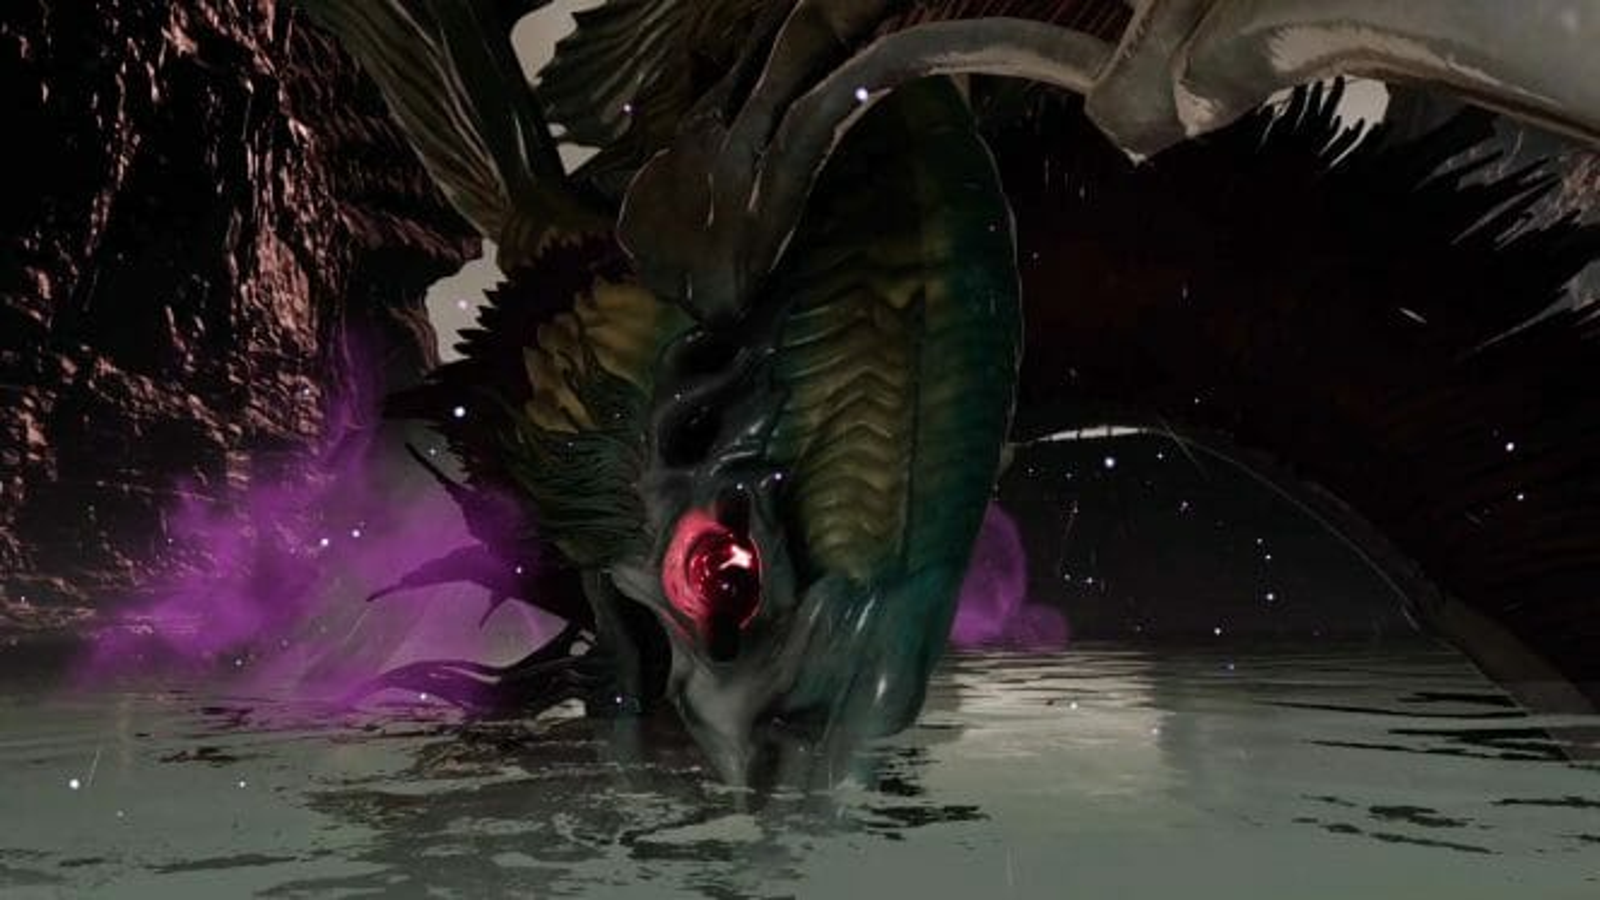 Monster Of The Deep: Final Fantasy Xv (Psvr) Review: Not-So-Deep Fishing Sim 3